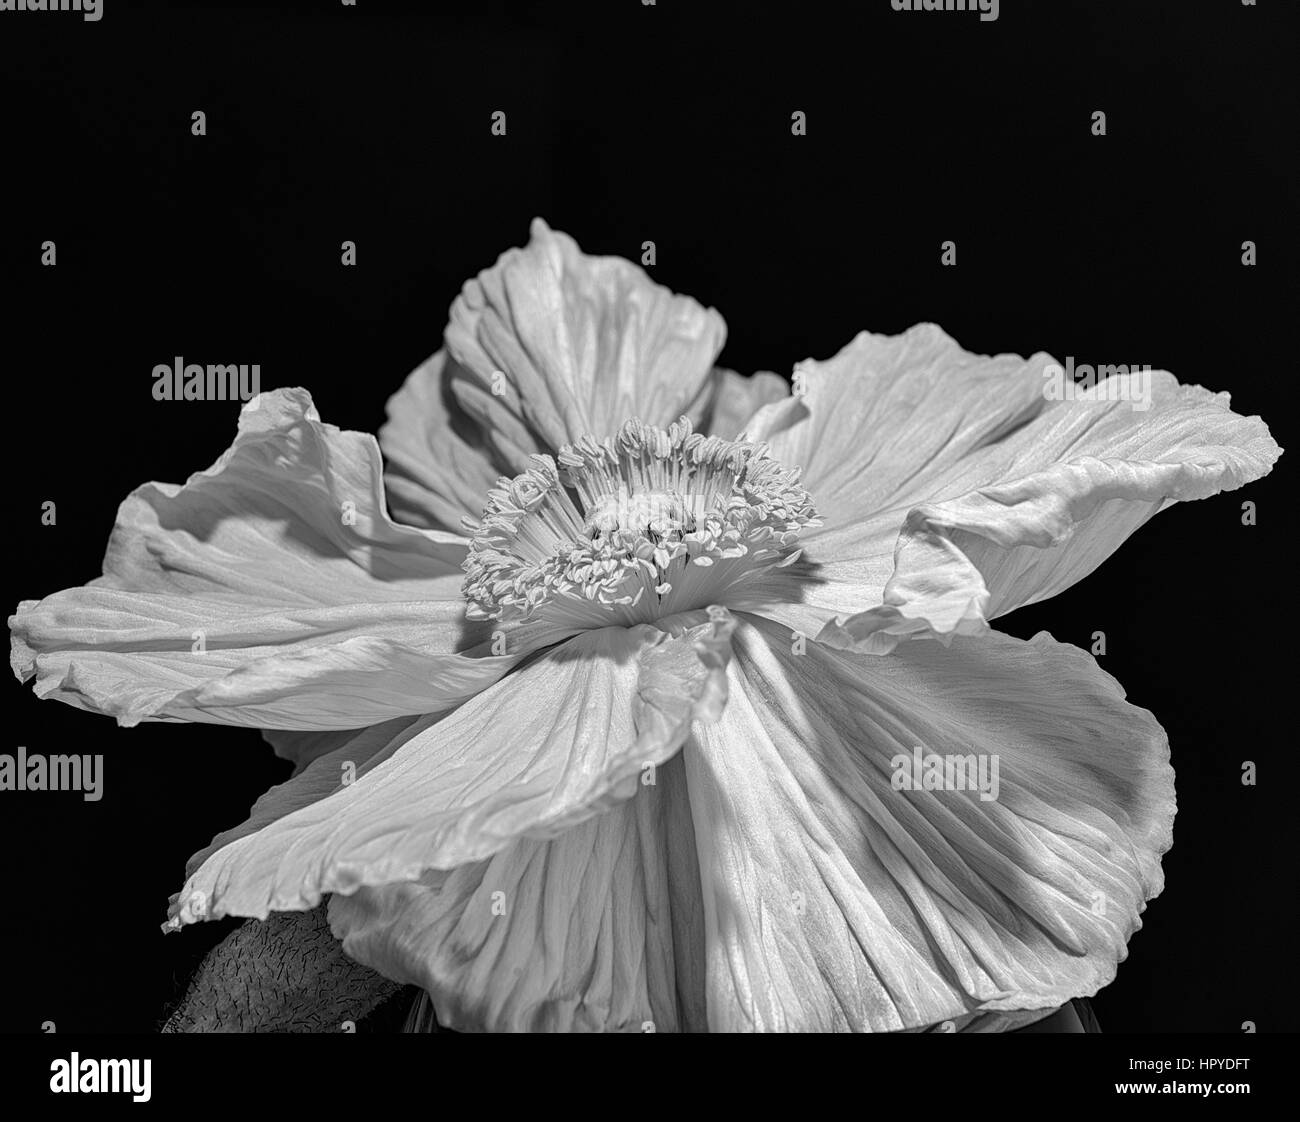 Satin Poppy Blossom Macro on black background in monochrome - Stock Image